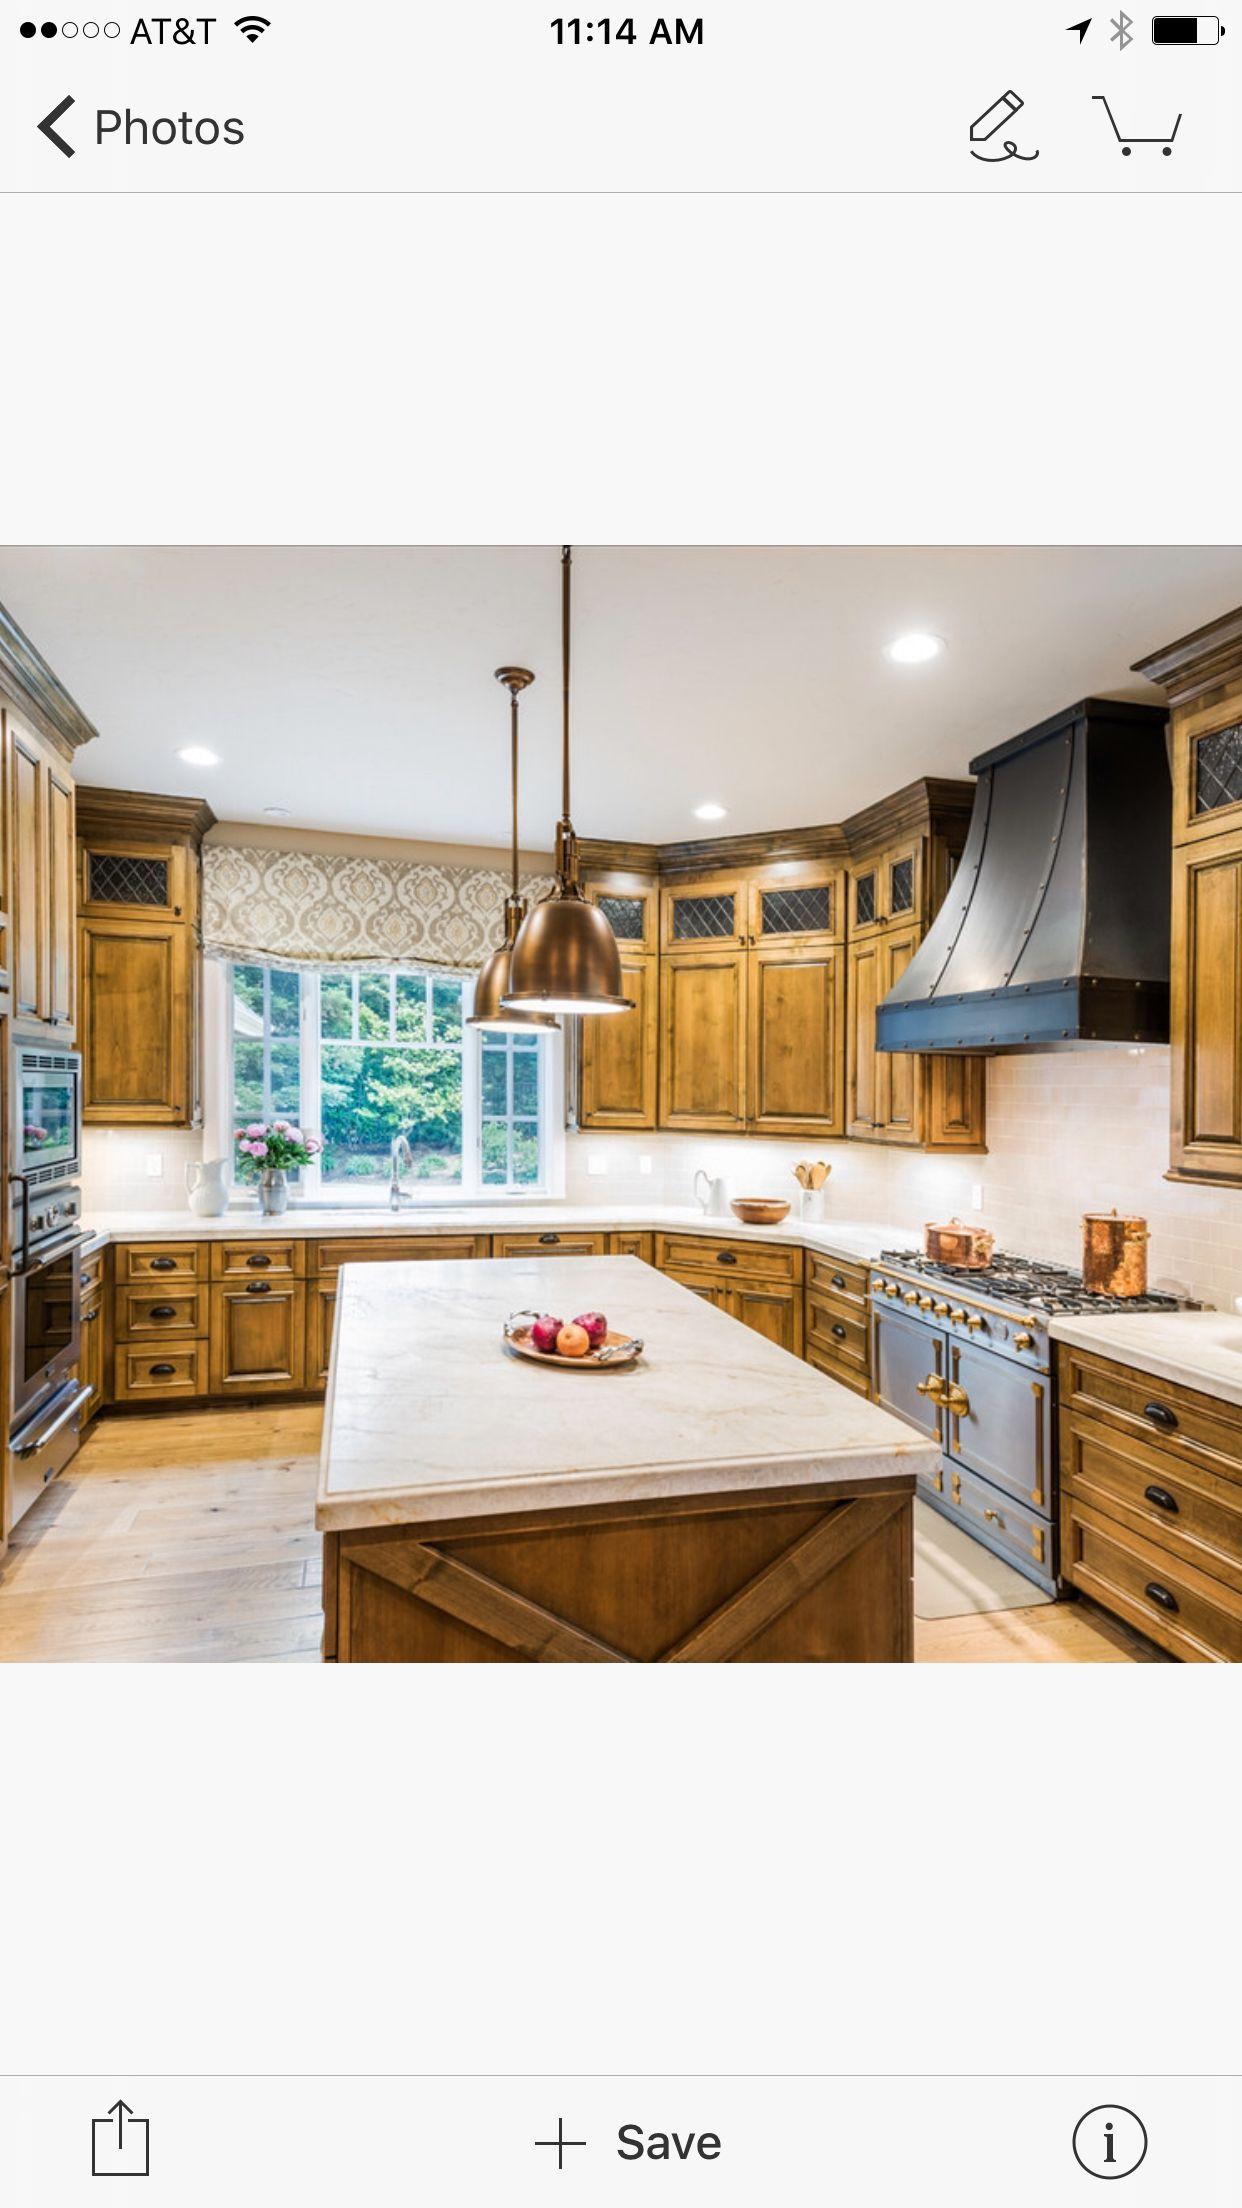 Best Kitchen With Perla Venata Quartzite Countertops Rustic 400 x 300